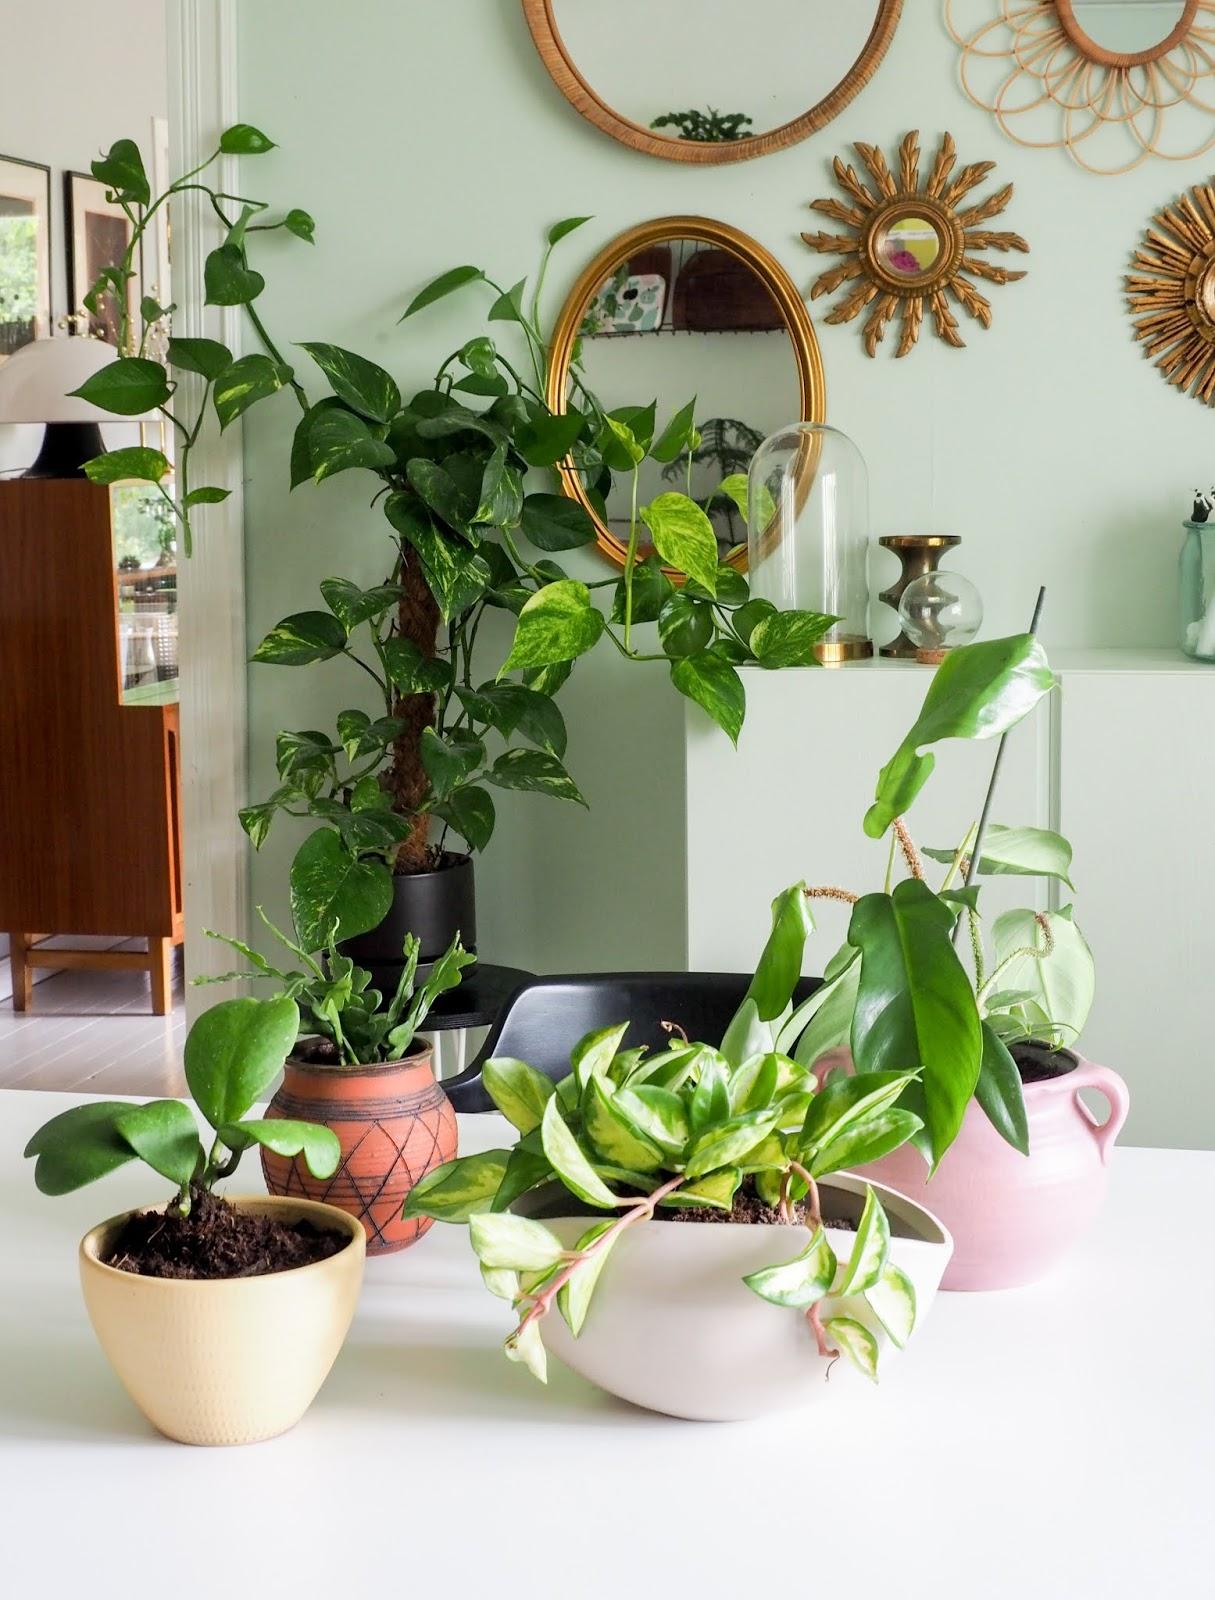 ruukku kasveille